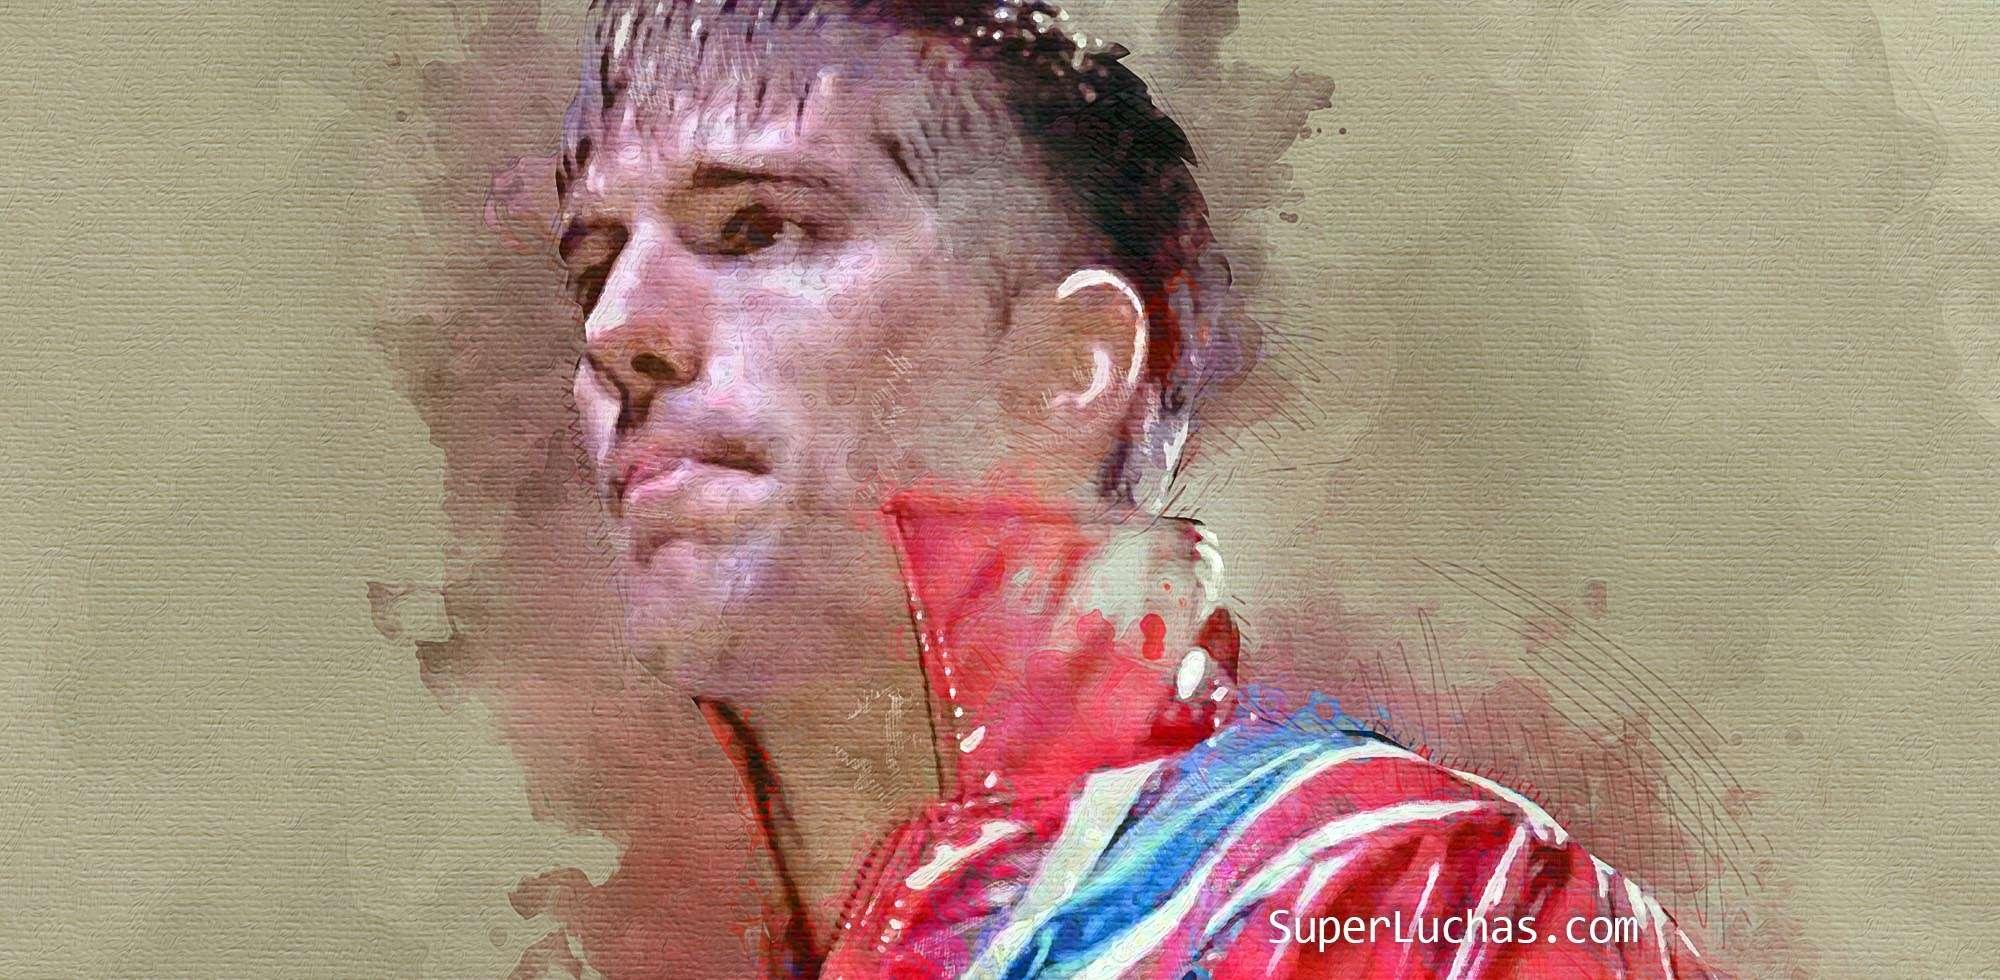 La lucha libre británica reacciona a la victoria de Zack Sabre Jr. 1